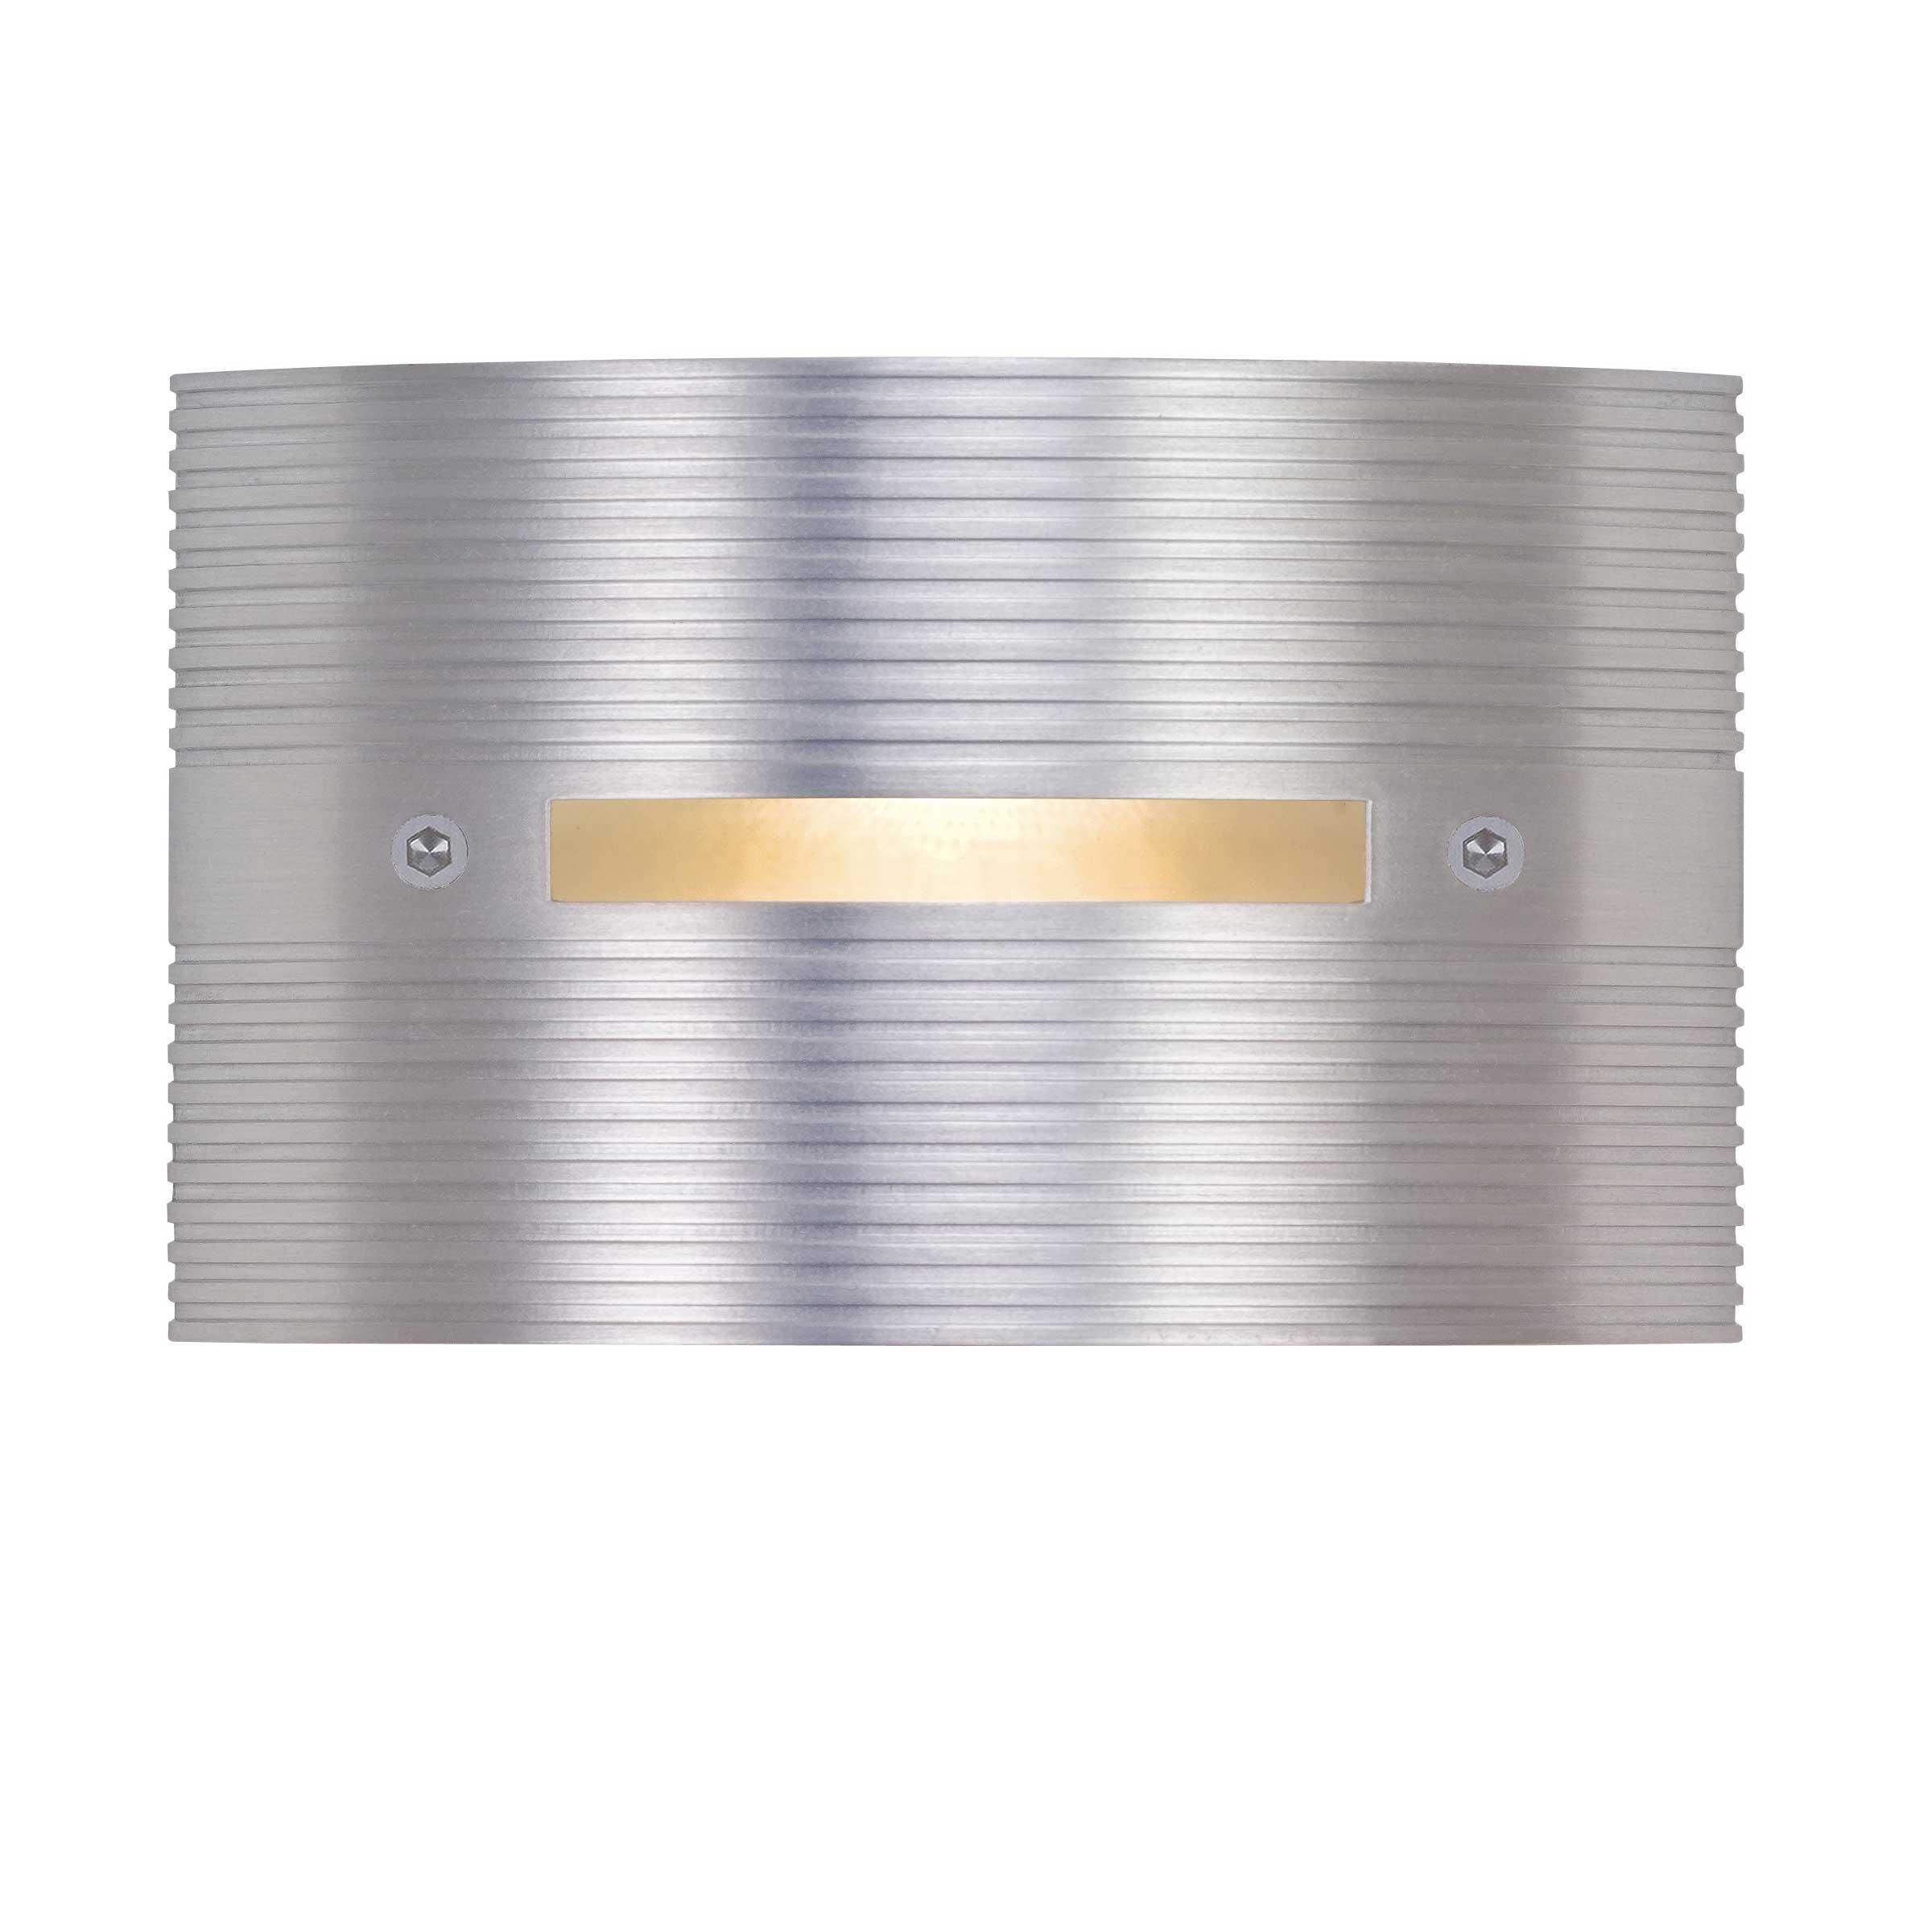 ss3002 led steplight by csl ss3002 sm